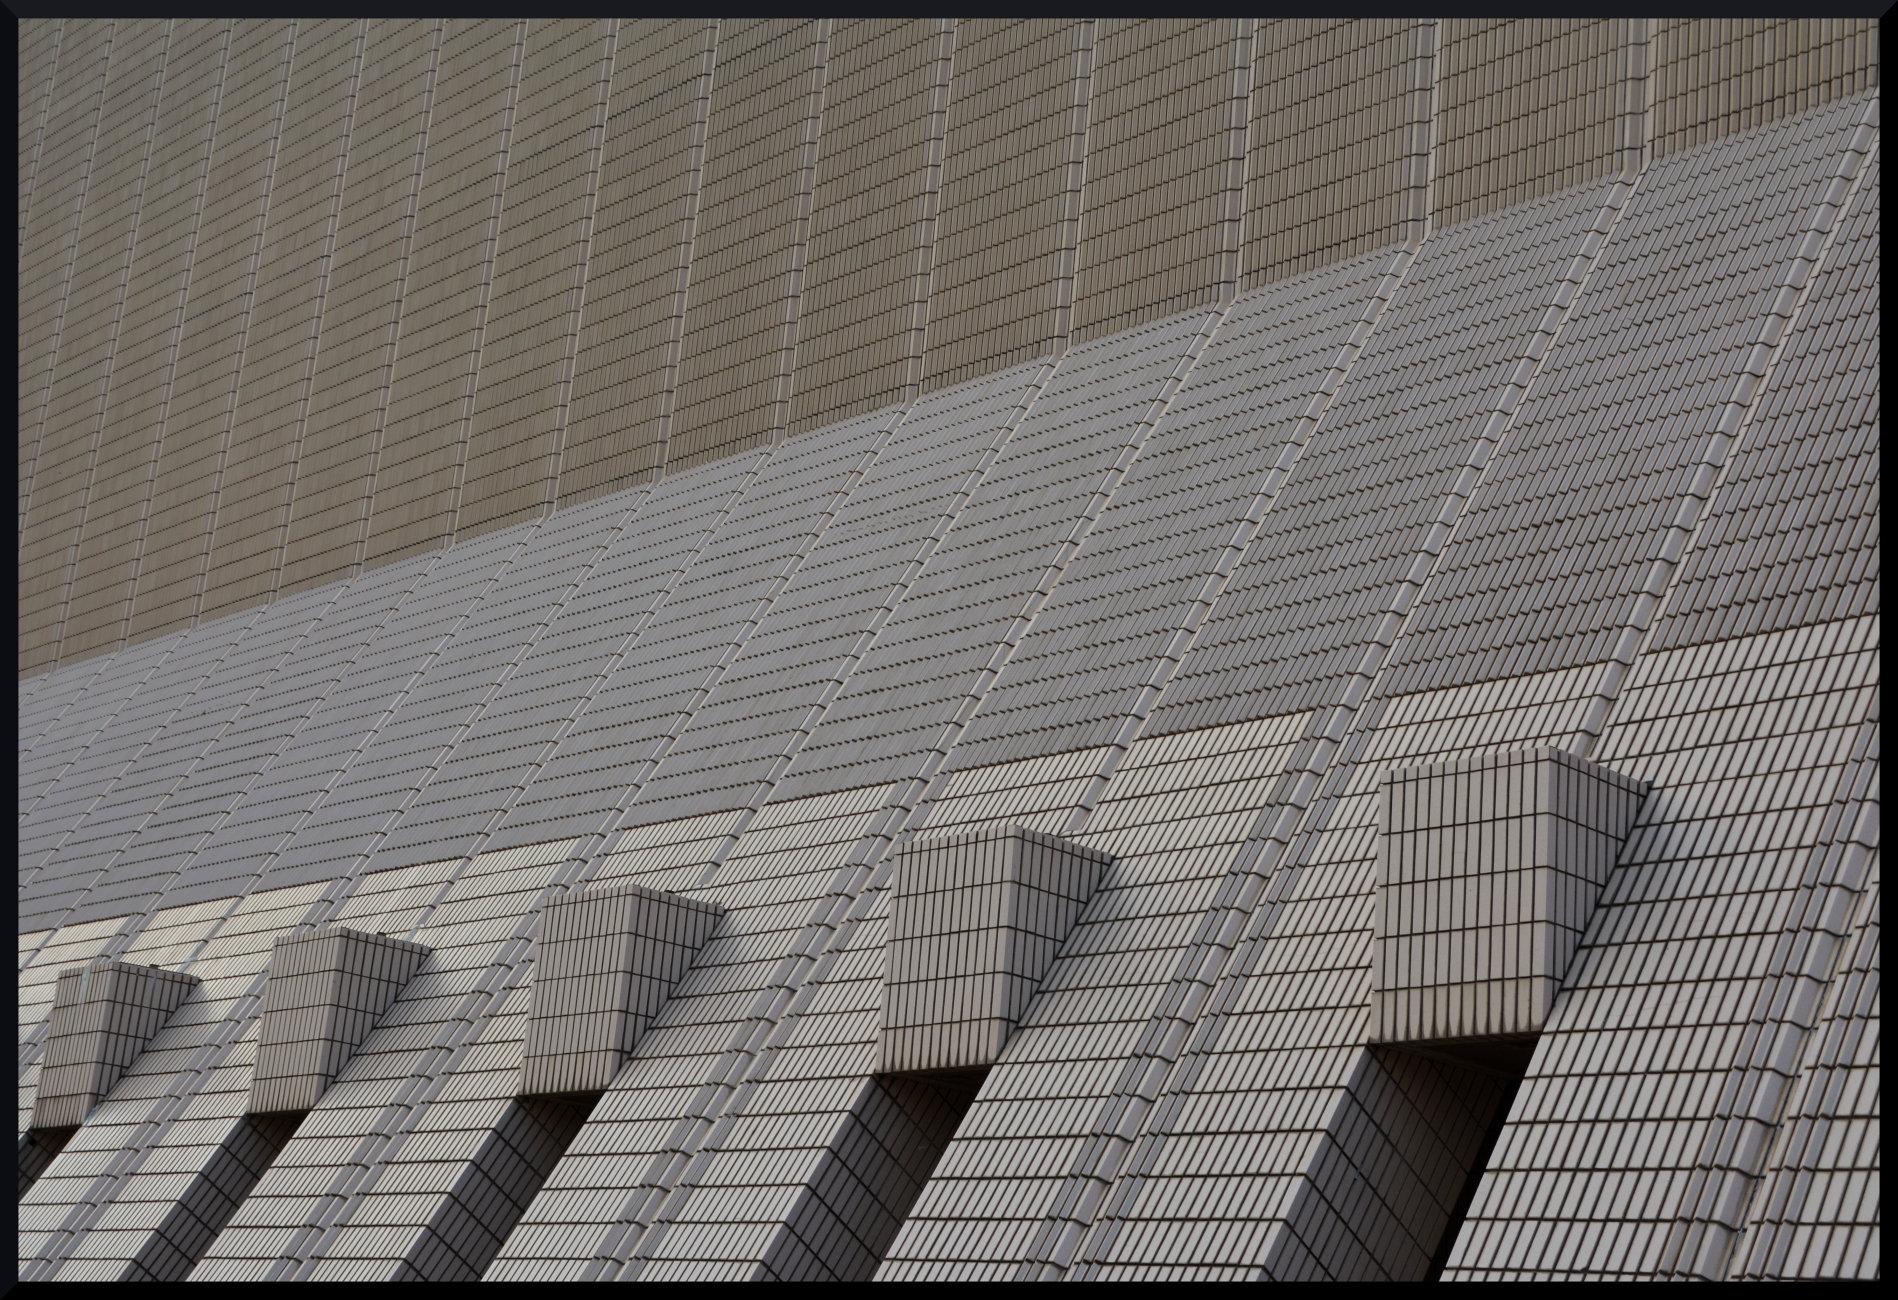 Hong Kong Cultural Building